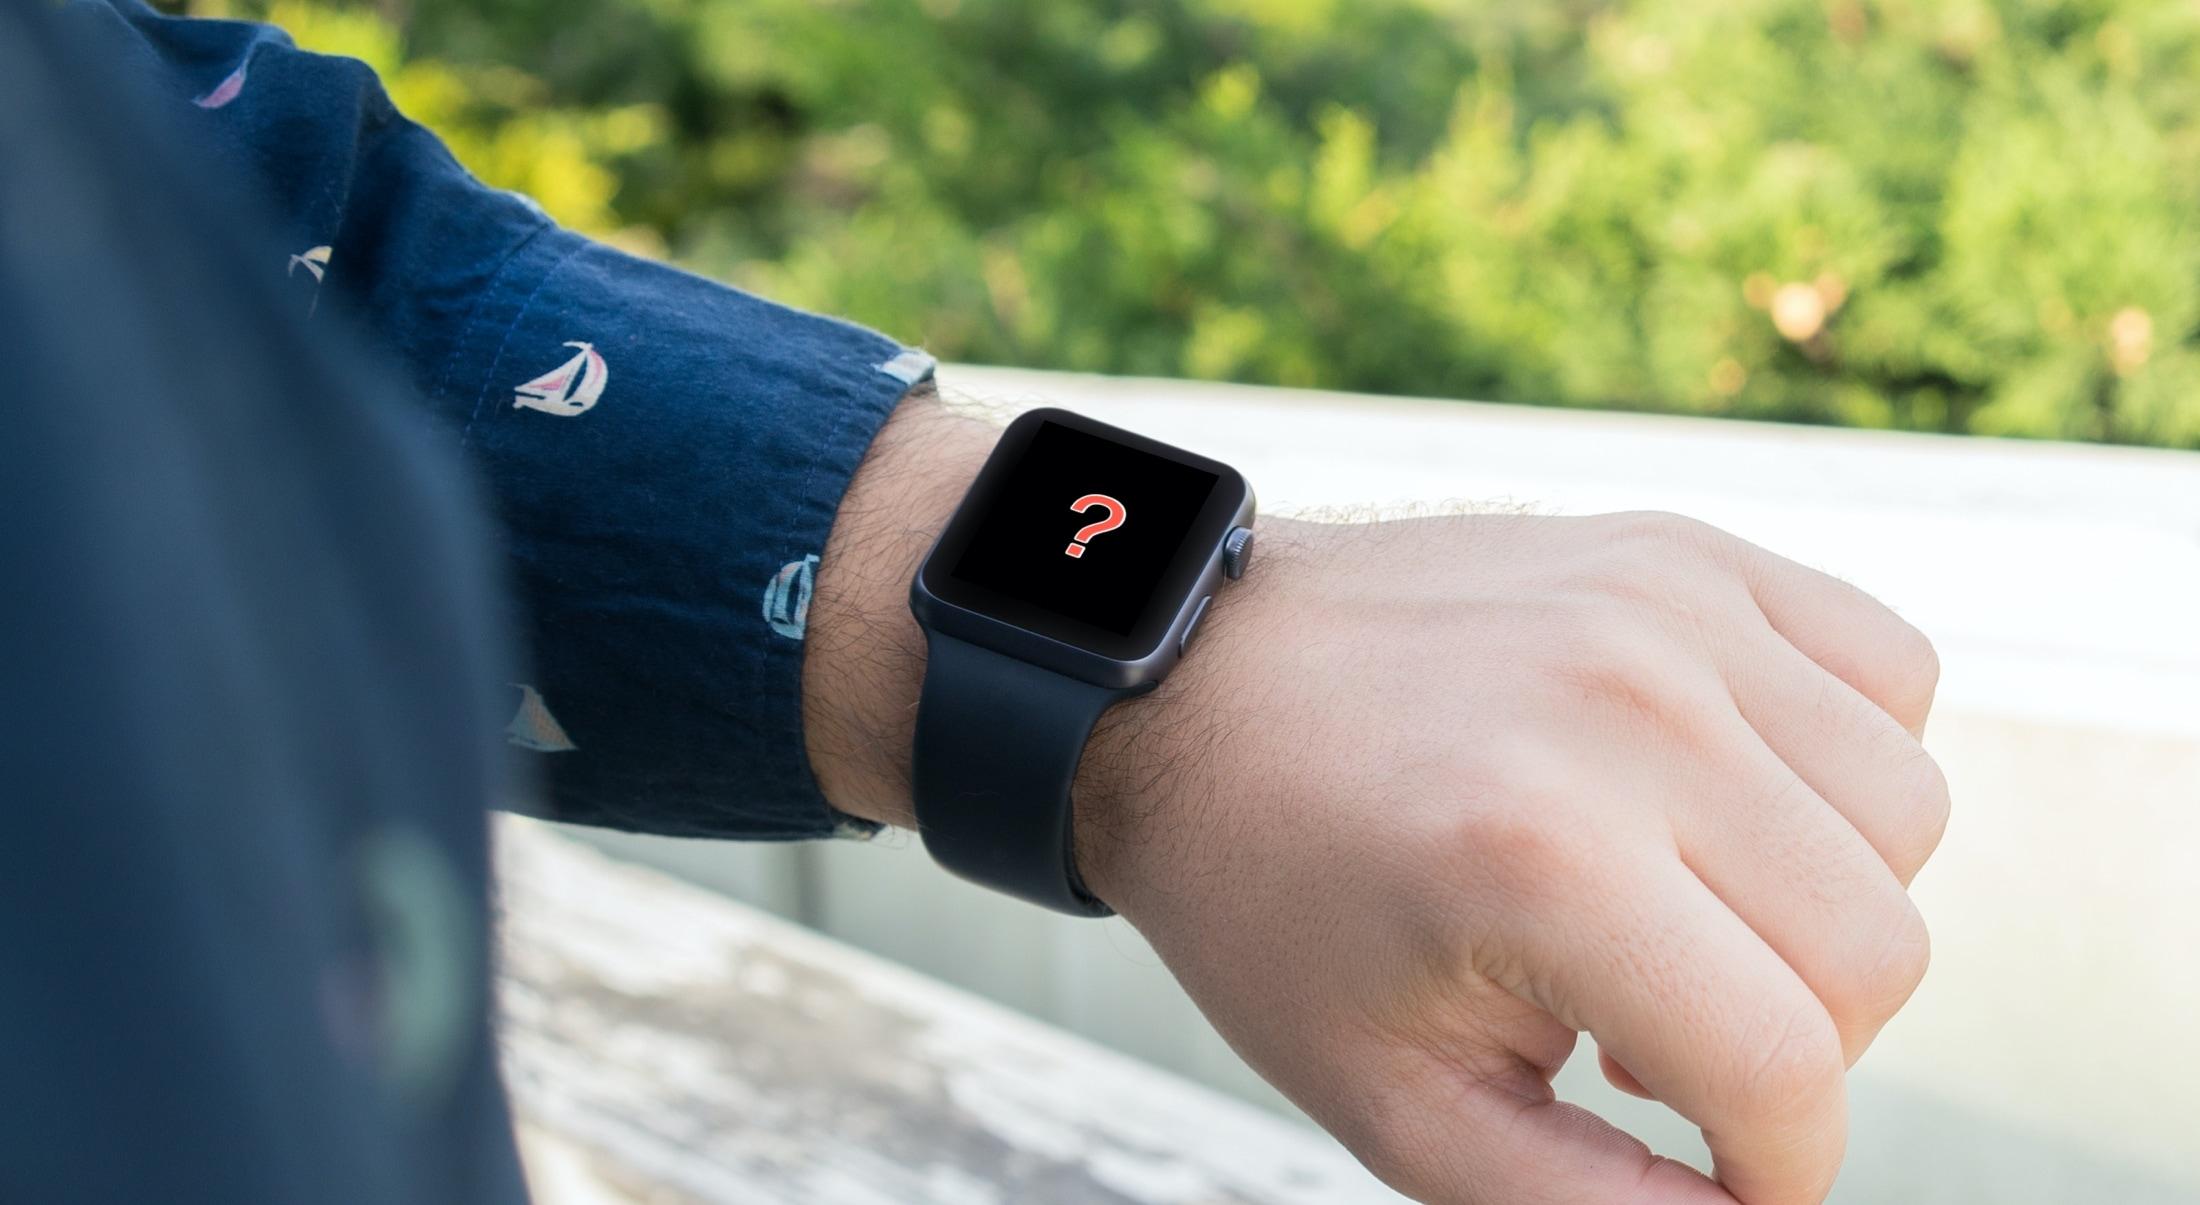 Question Mark on Apple Watch